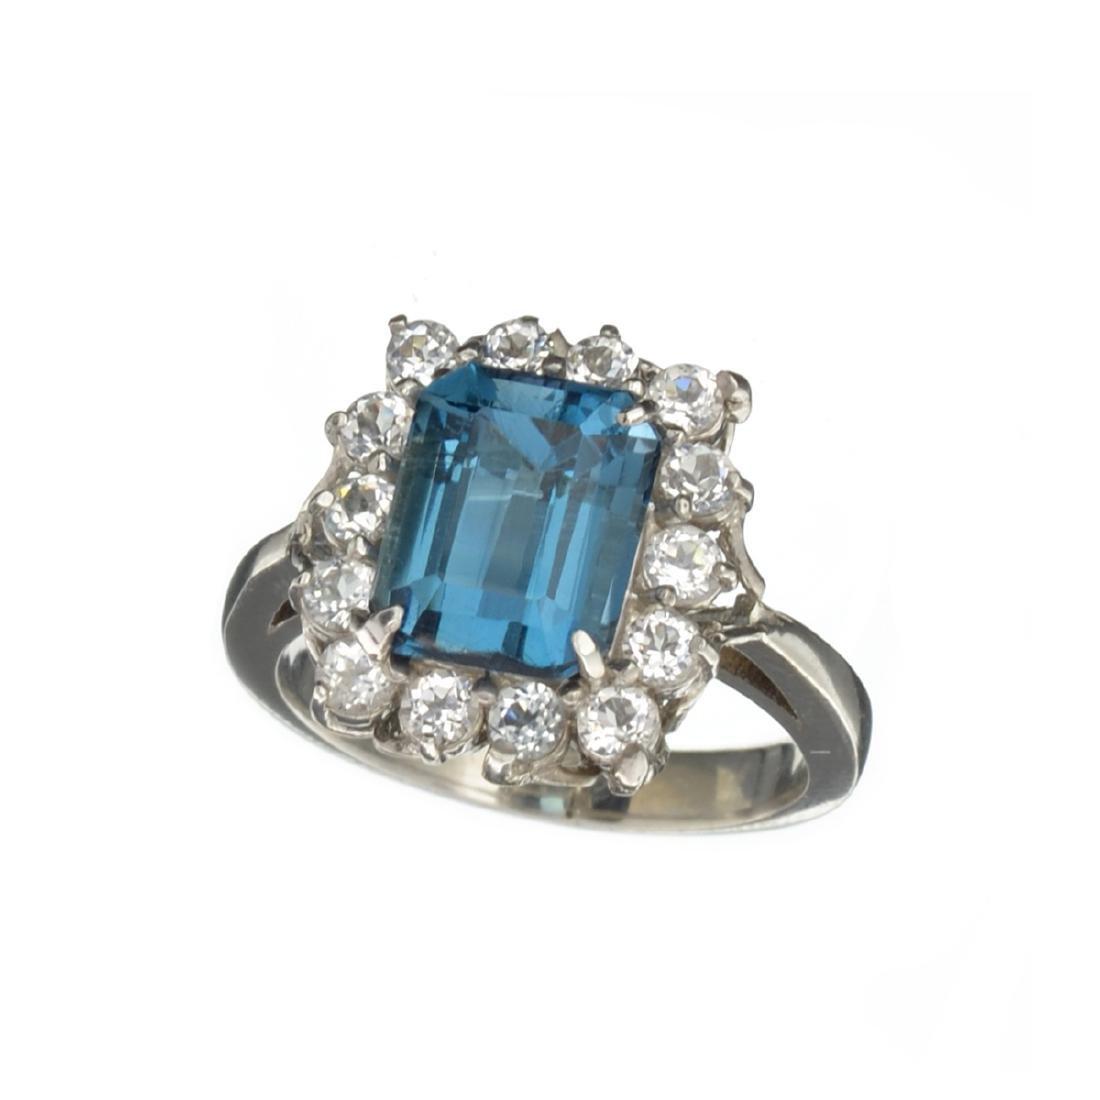 APP: 1k Fine Jewelry 6.23CT Blue Topaz And White